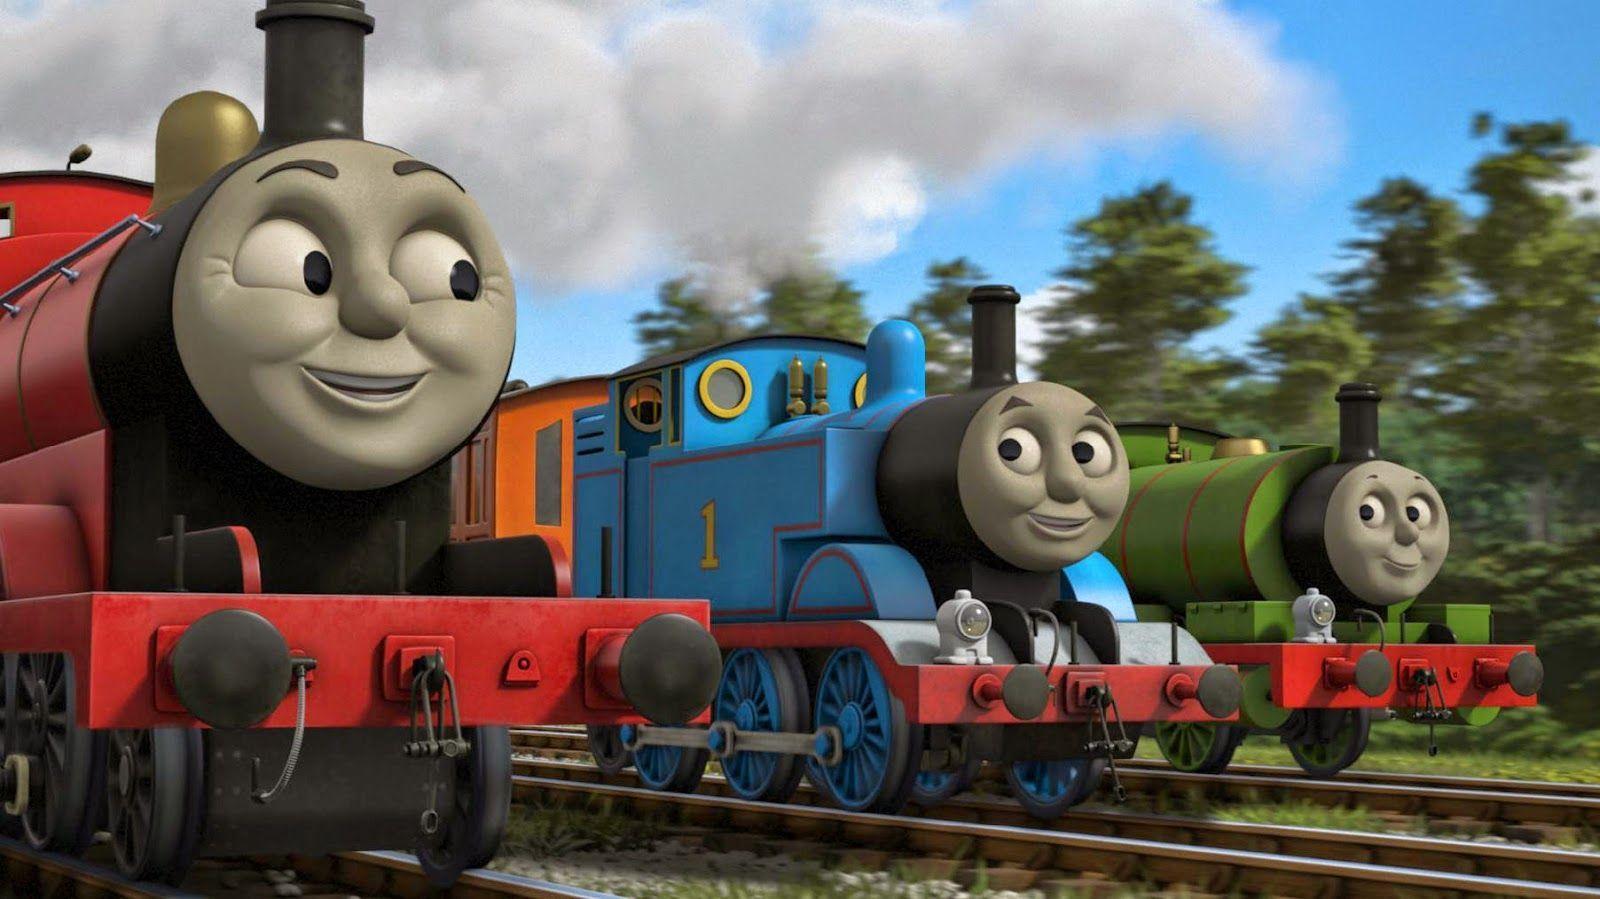 Thomas The Train Wallpapers Wallpaper